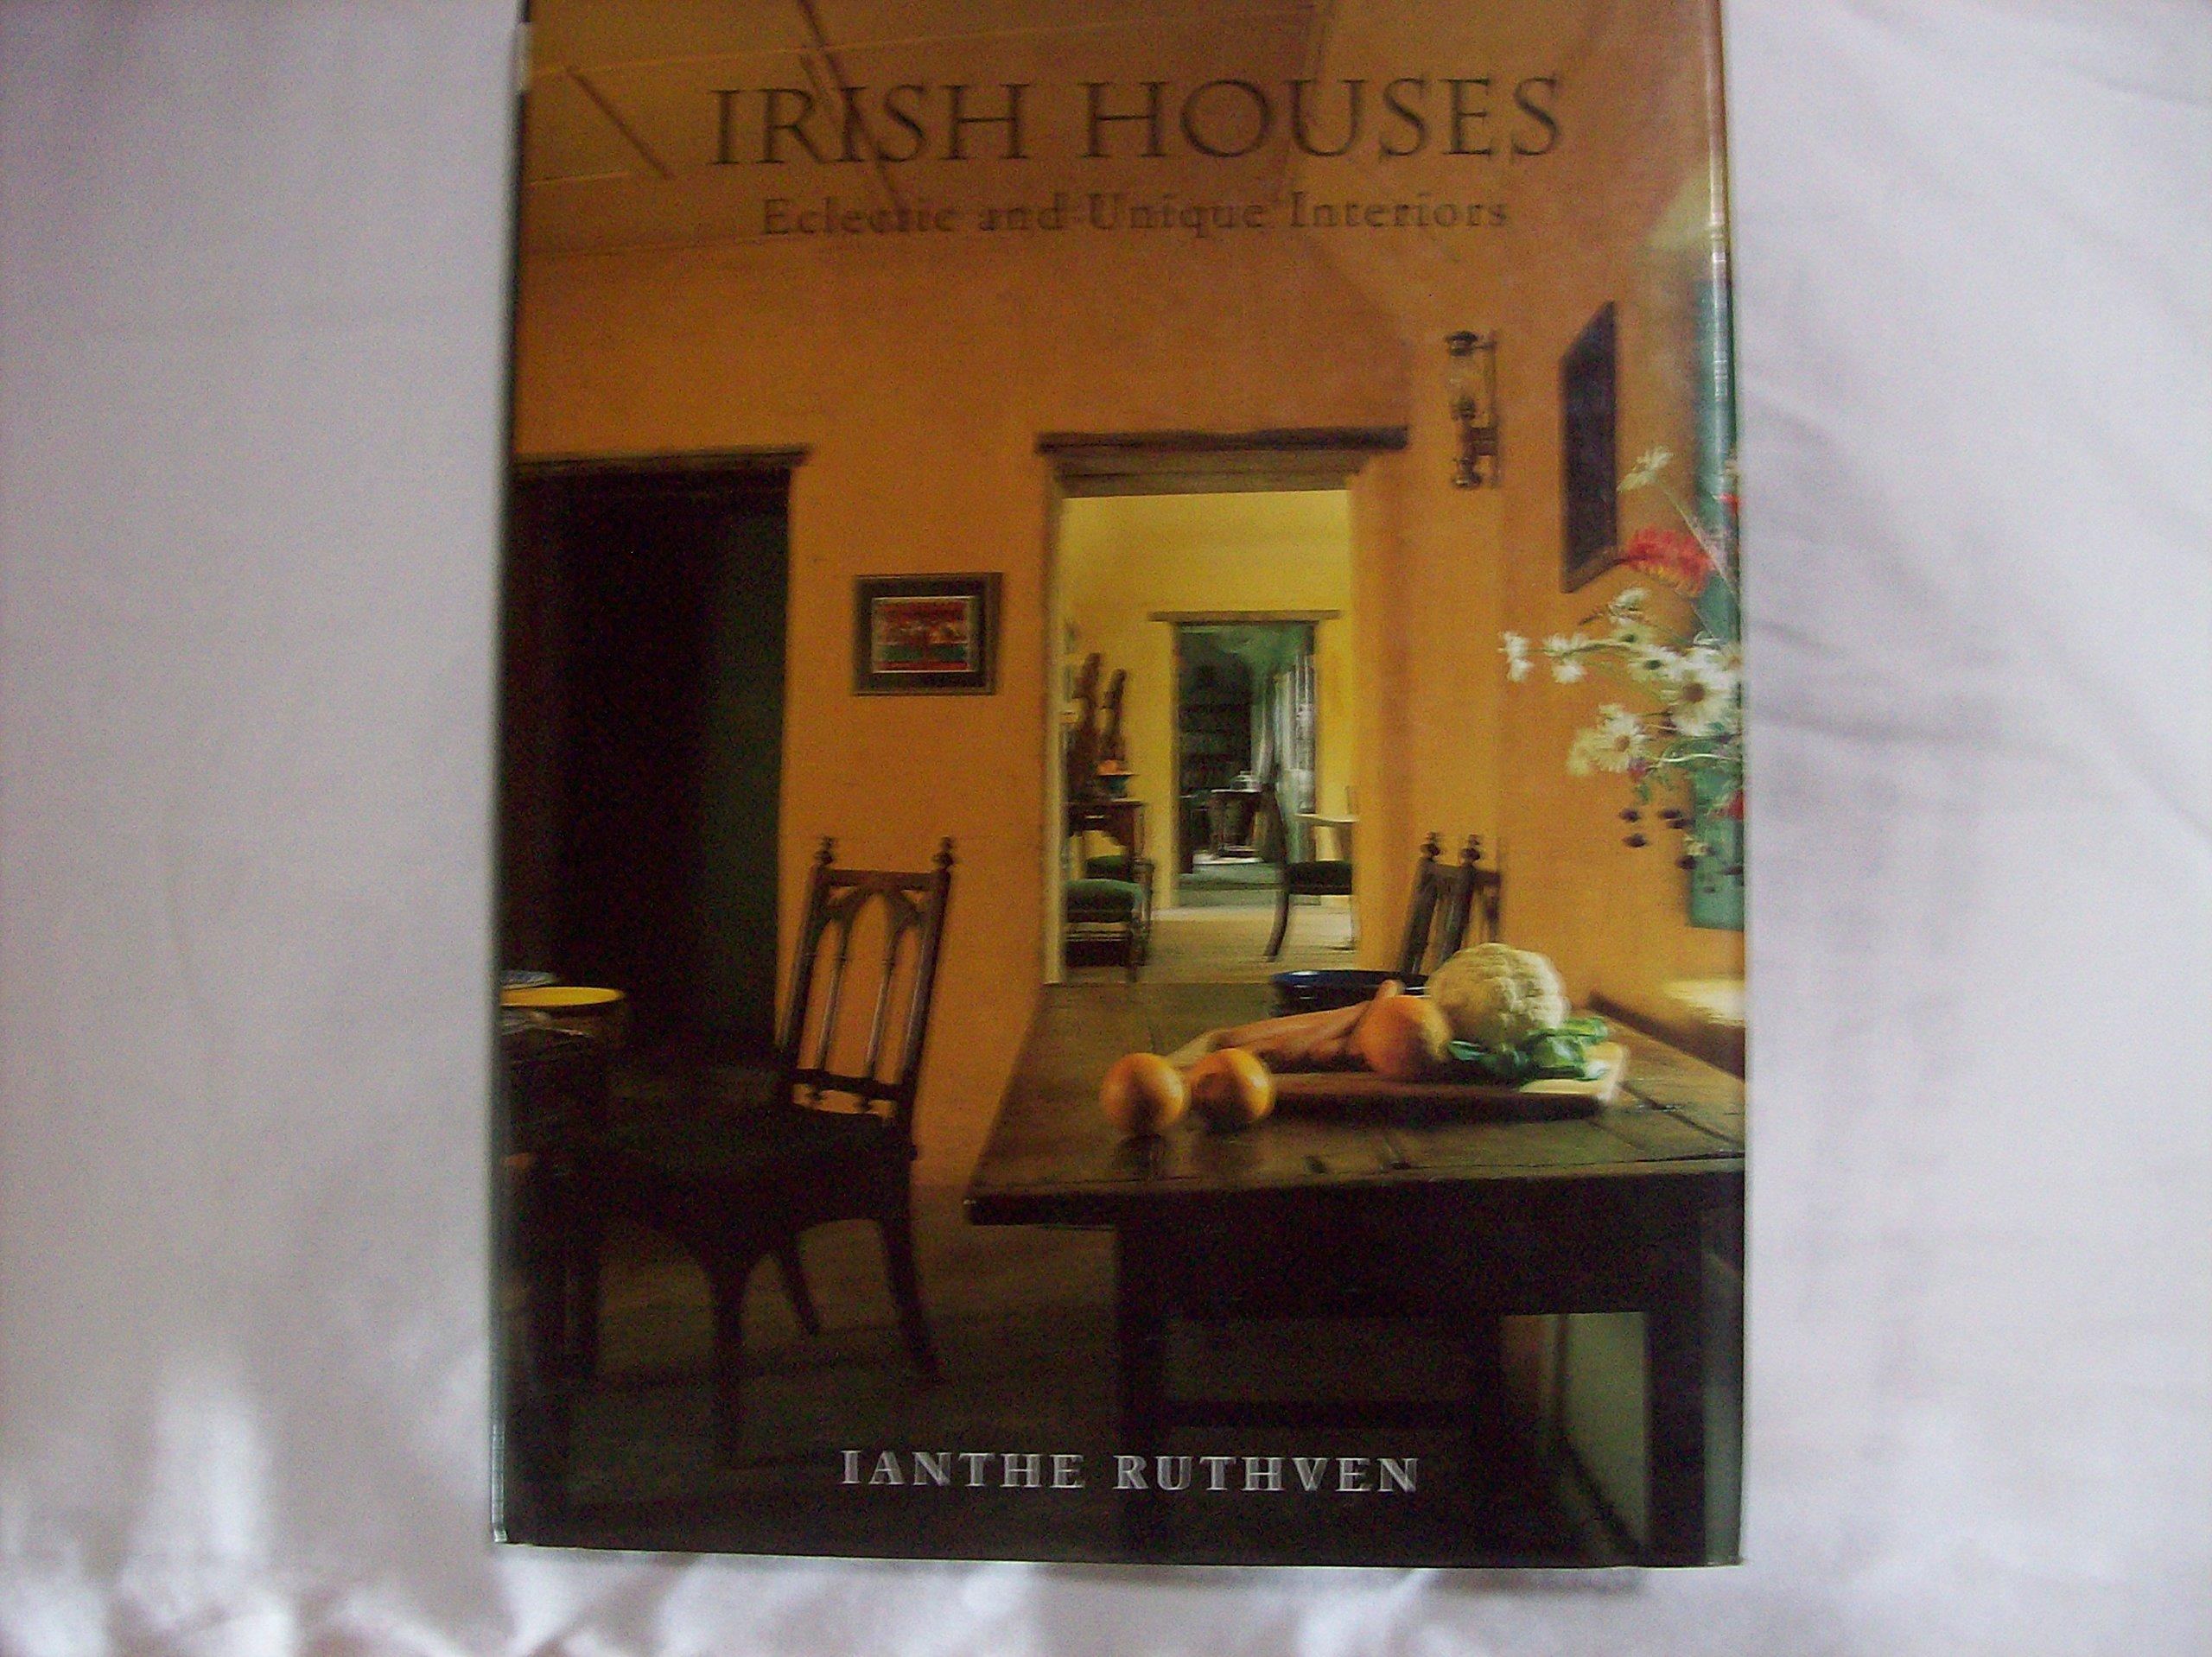 Irish Houses: Eclectic and Unique Interiors